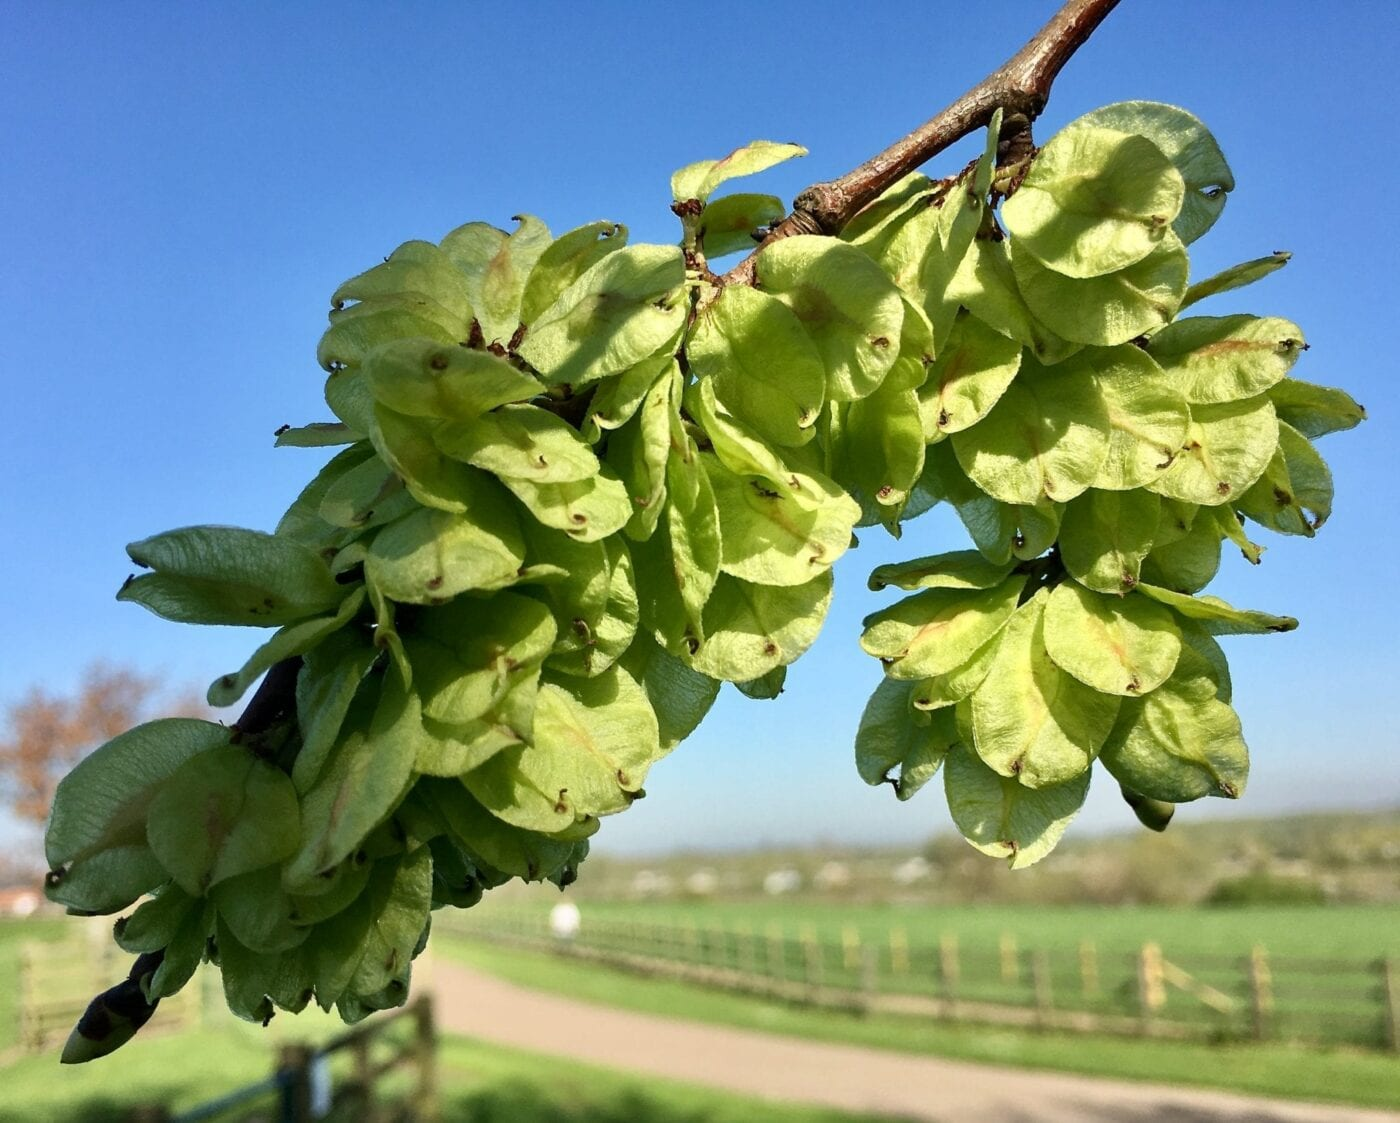 Wych Elm fruit in April